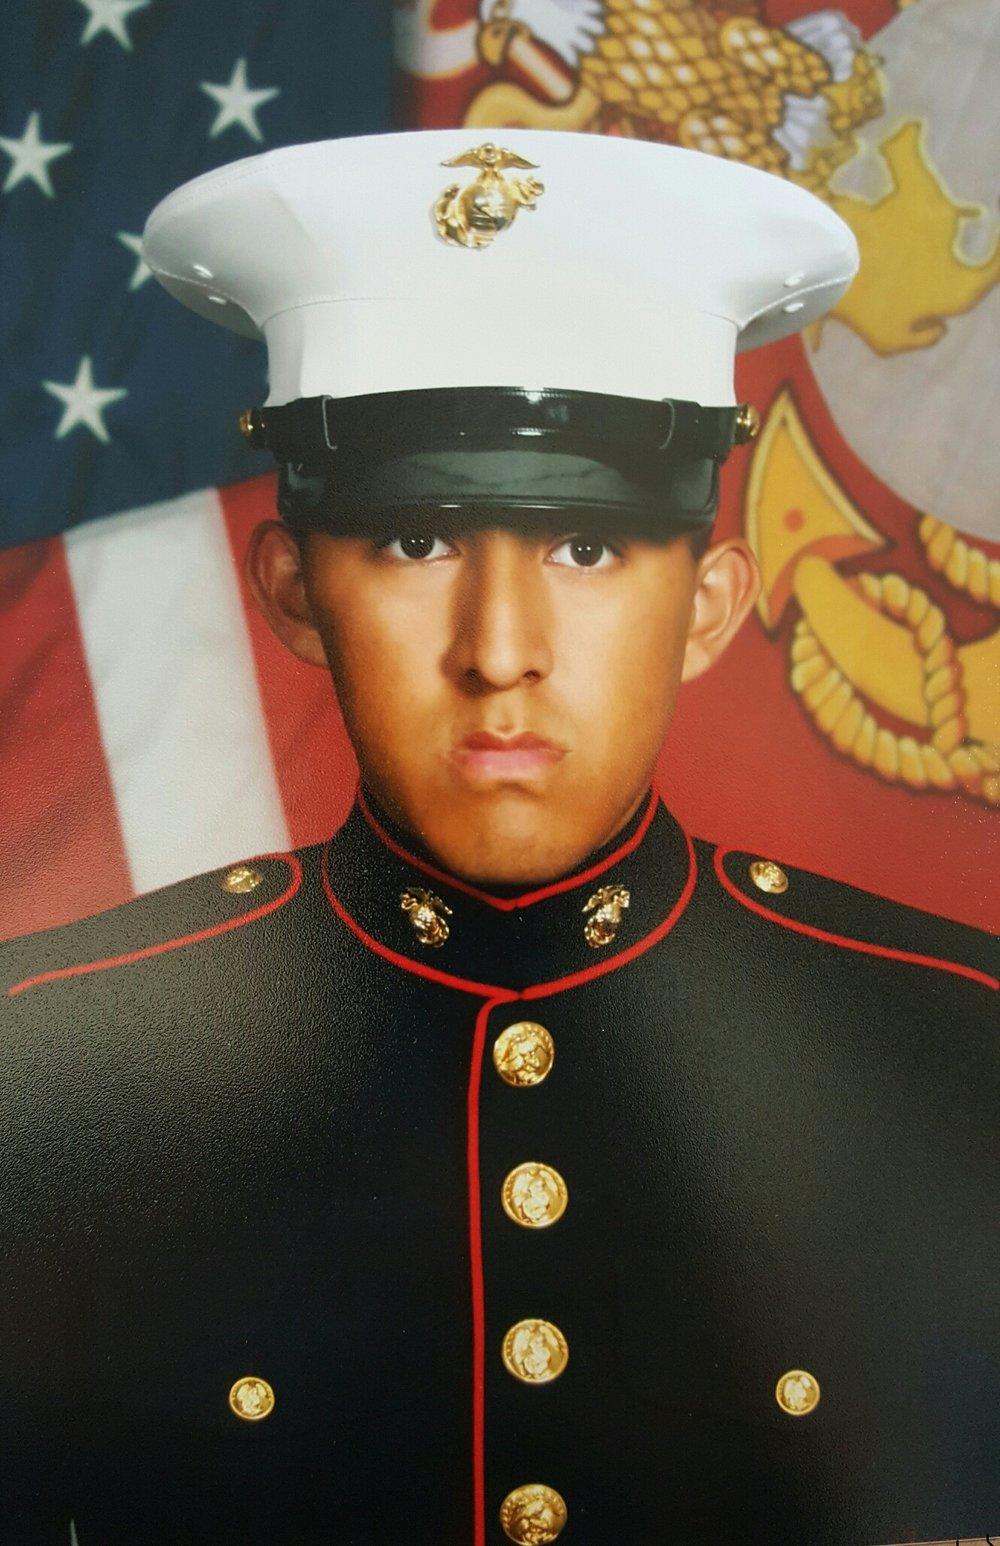 PFC Marcos Estecoc  Godinez High School  U.S. Marine Corps Fuel Artillery Cannoneer  2011-2015